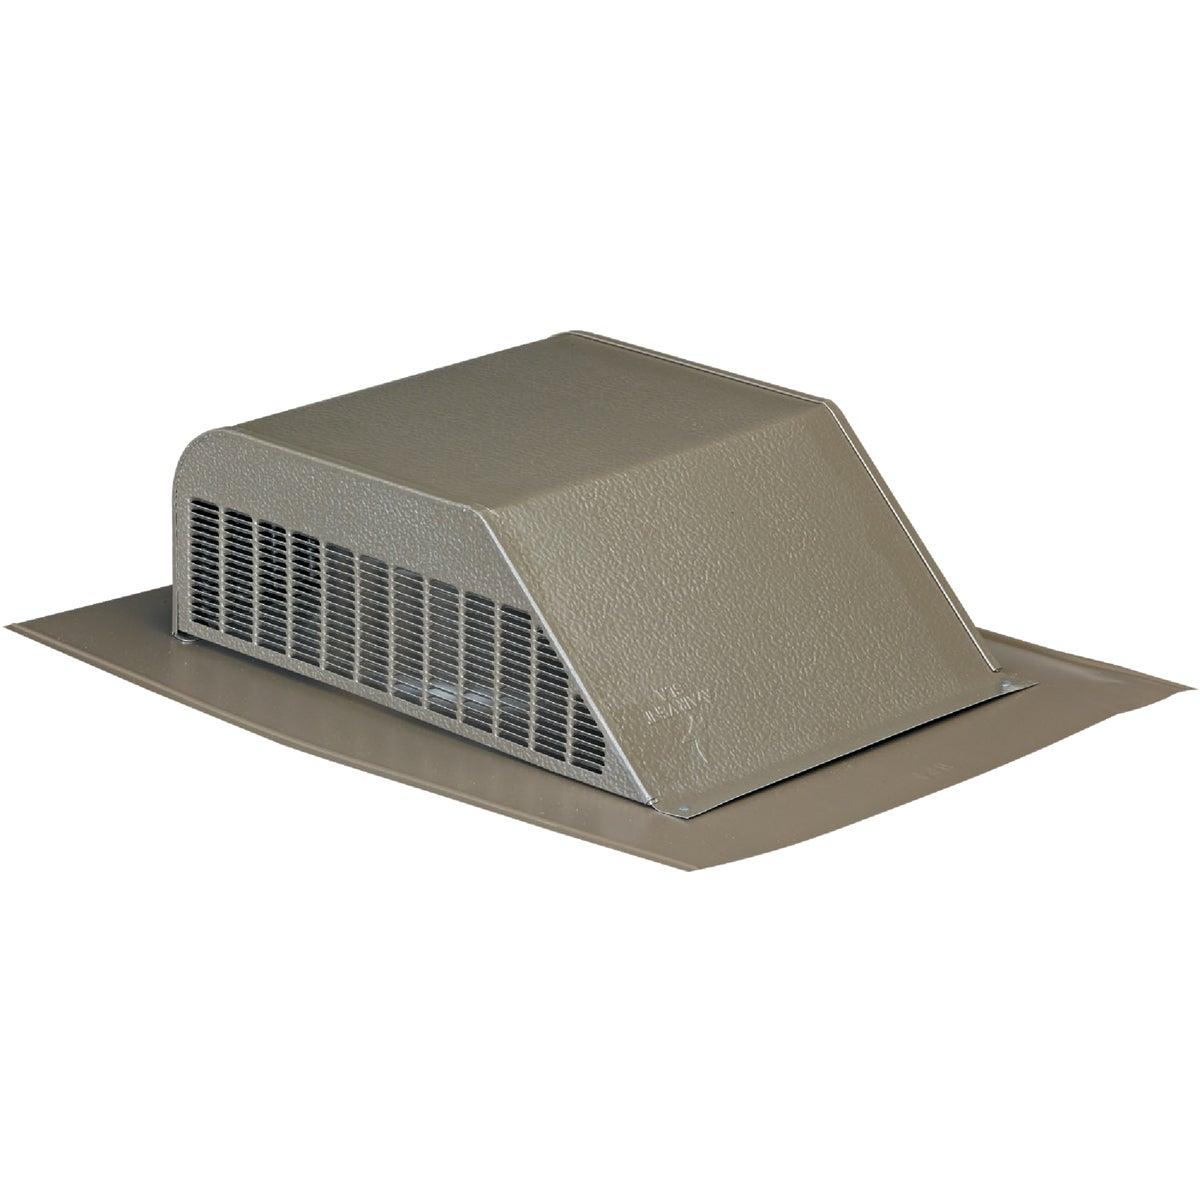 Airhawk 50 In. Aluminum Slant Back Roof Vent, 85284